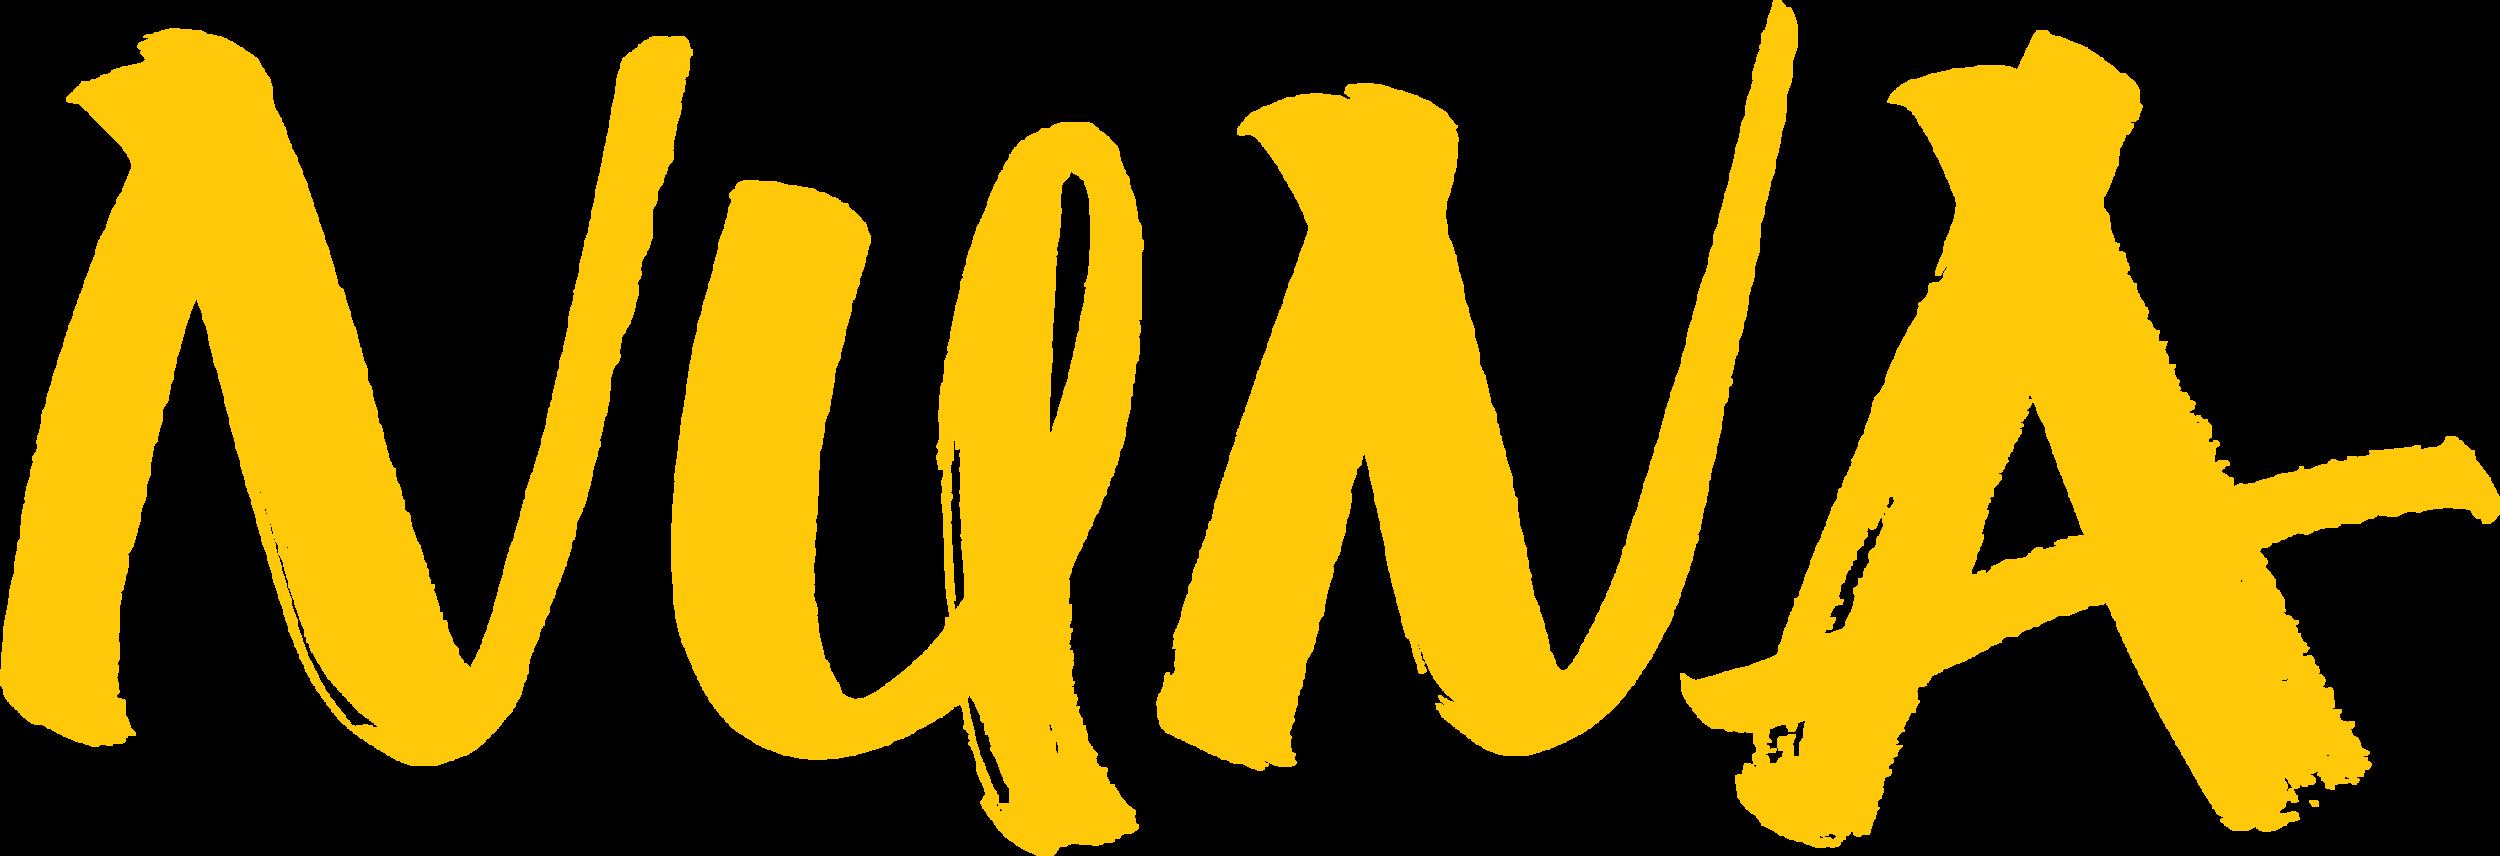 Nuna_Yellow_Logo.png